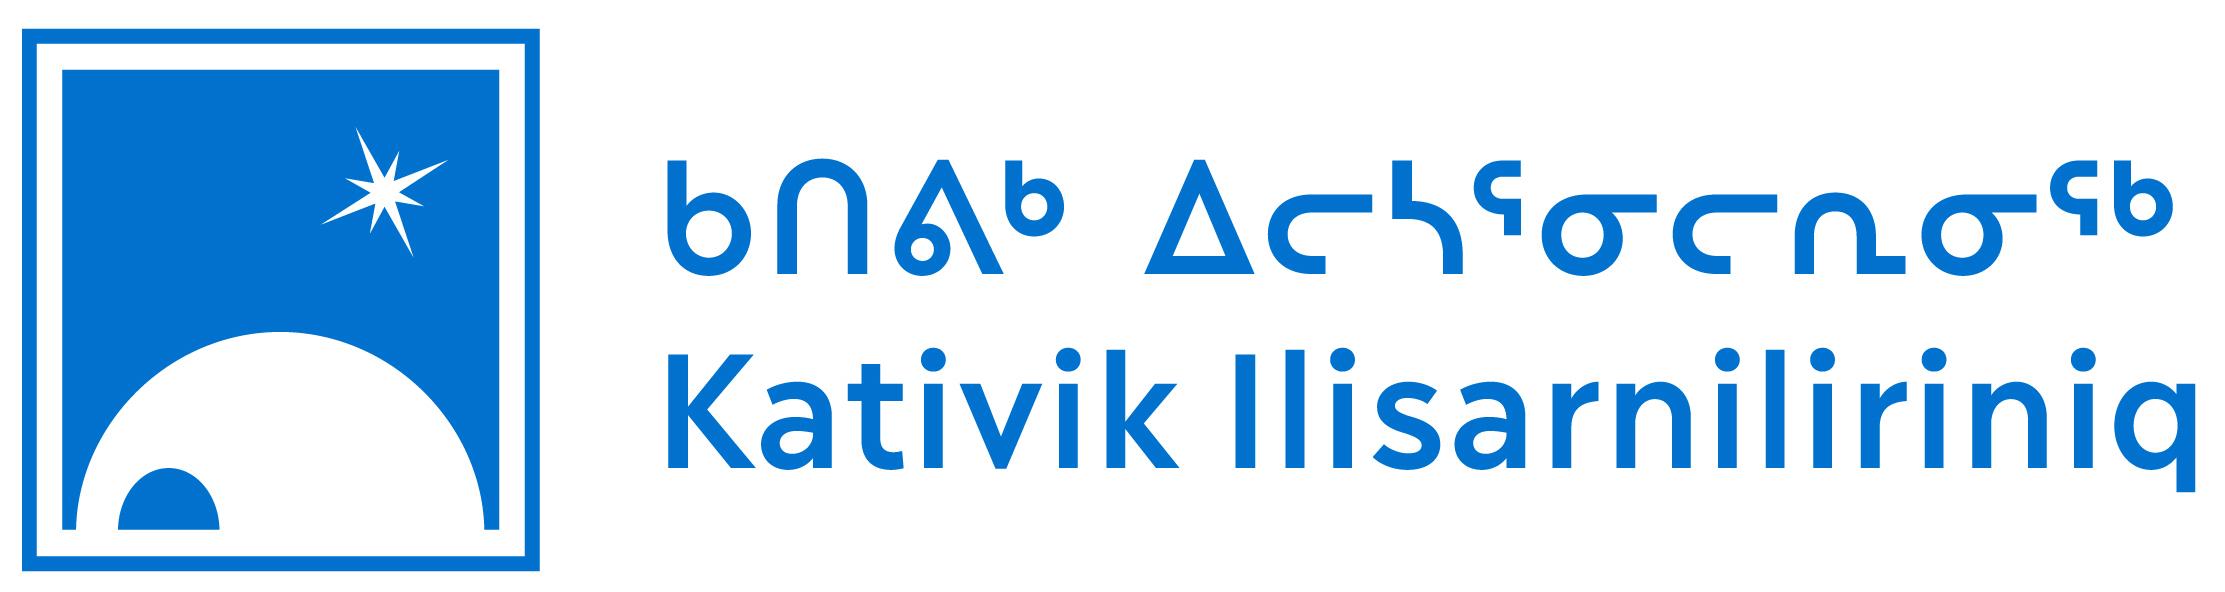 Kativik Ilisarniliriniq